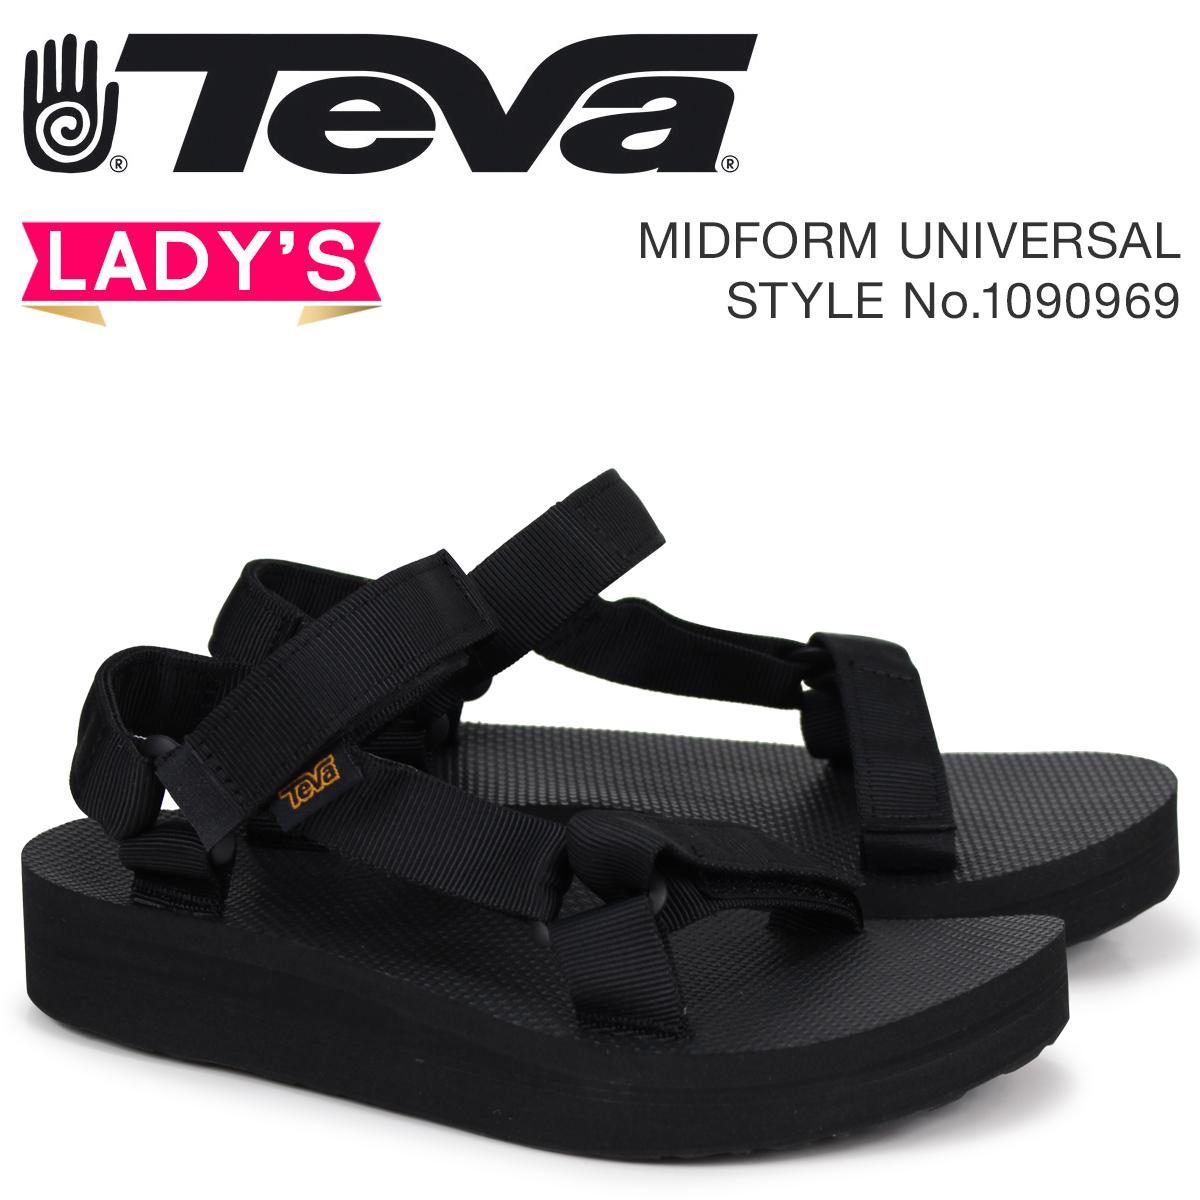 8f6ecb3713c Teva Teva sandals Lady's mid form universal MIDFORM UNIVERSAL black 1090969  ...